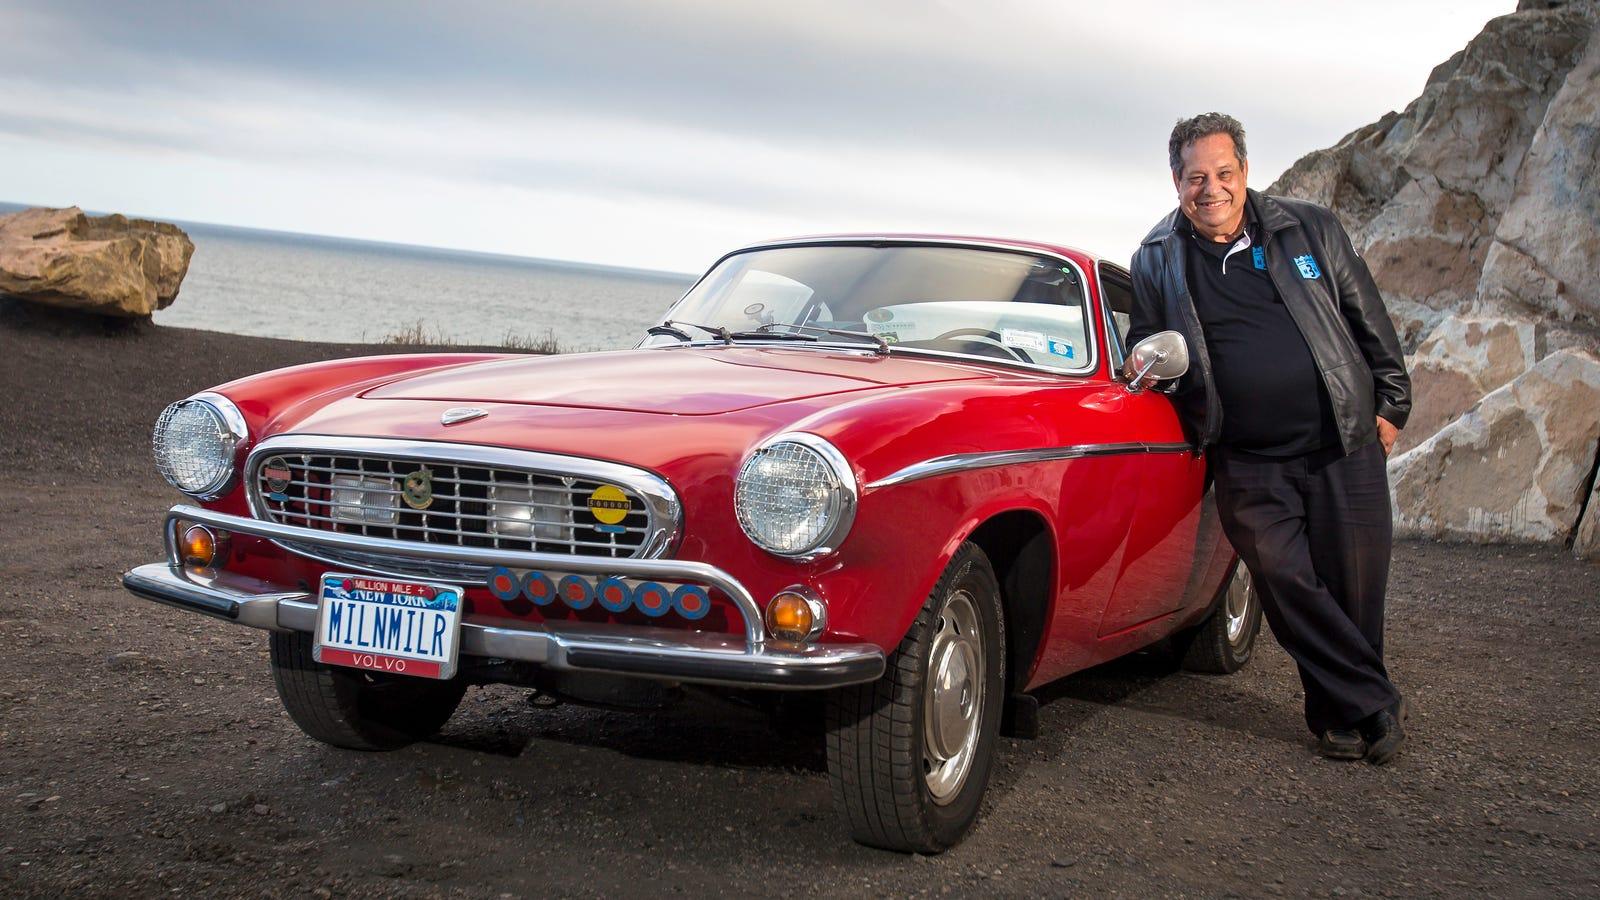 Irv Gordon, the Hero Who Drove His Volvo P1800 Over 3.2 Million Miles, Has Died